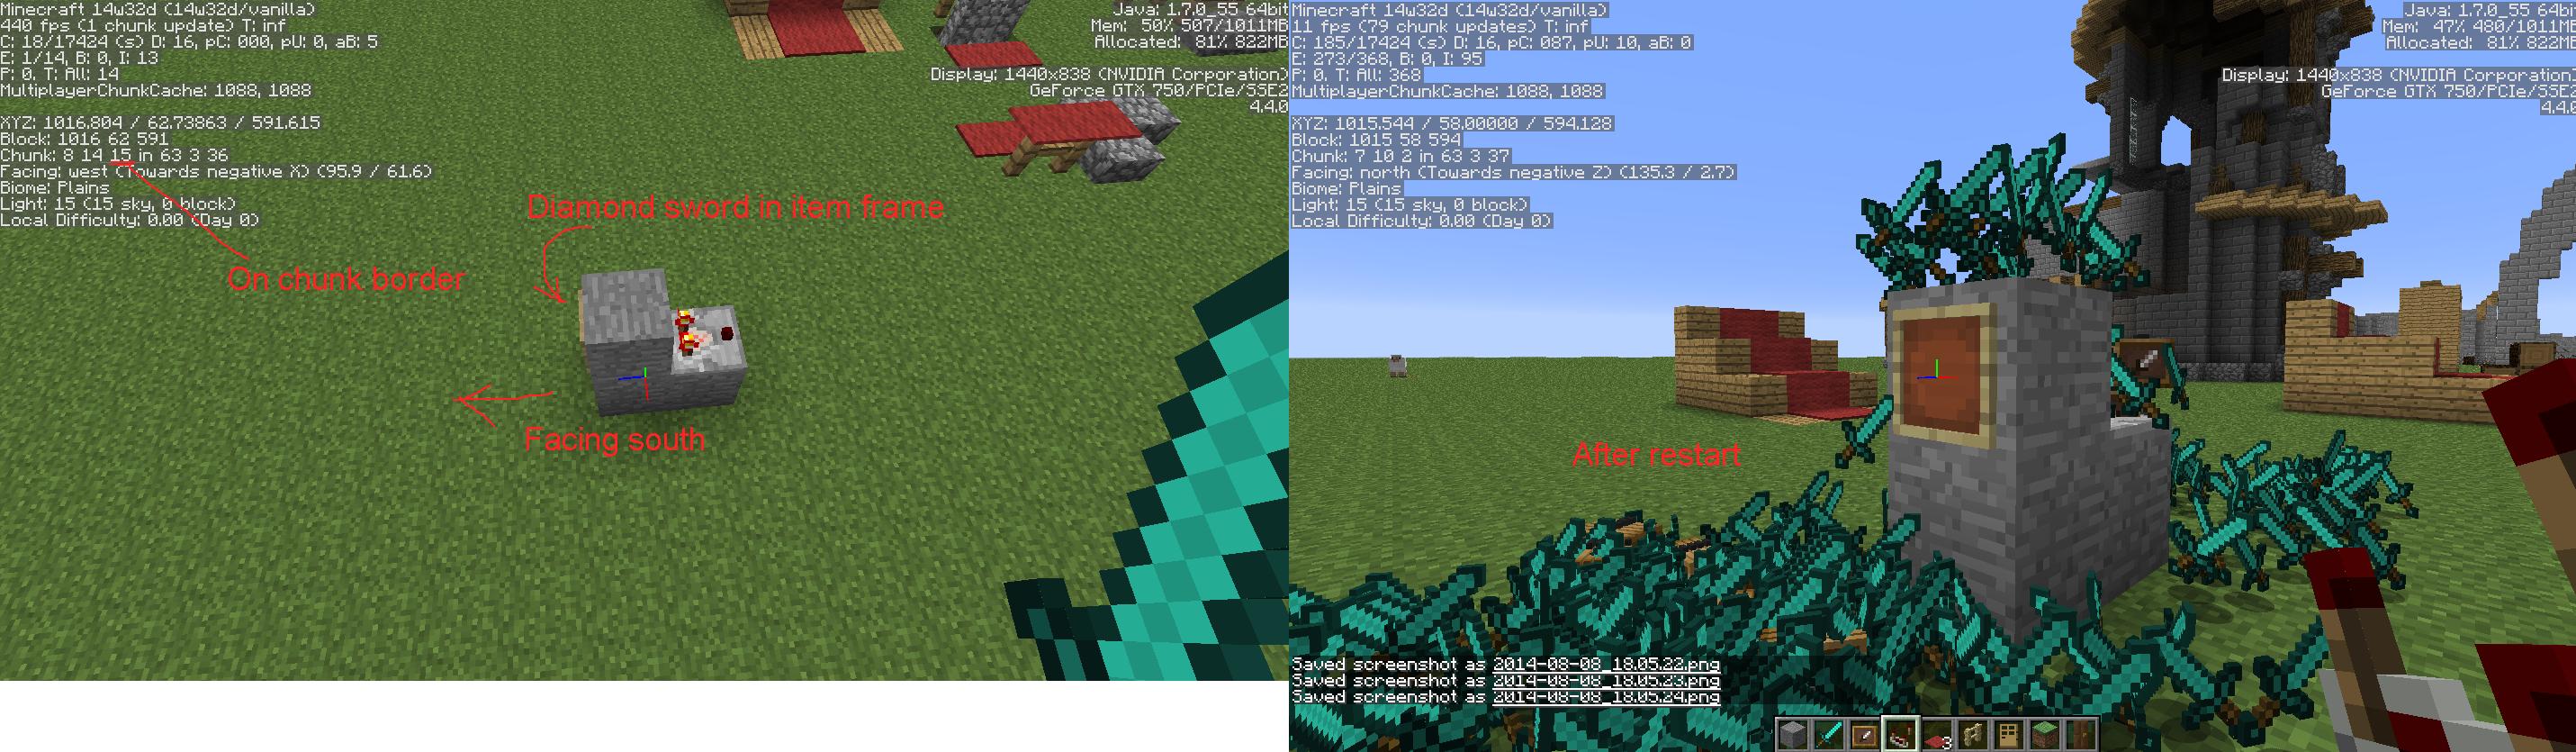 MC-66196] Dupe glitch with Item frames & comparators - Jira